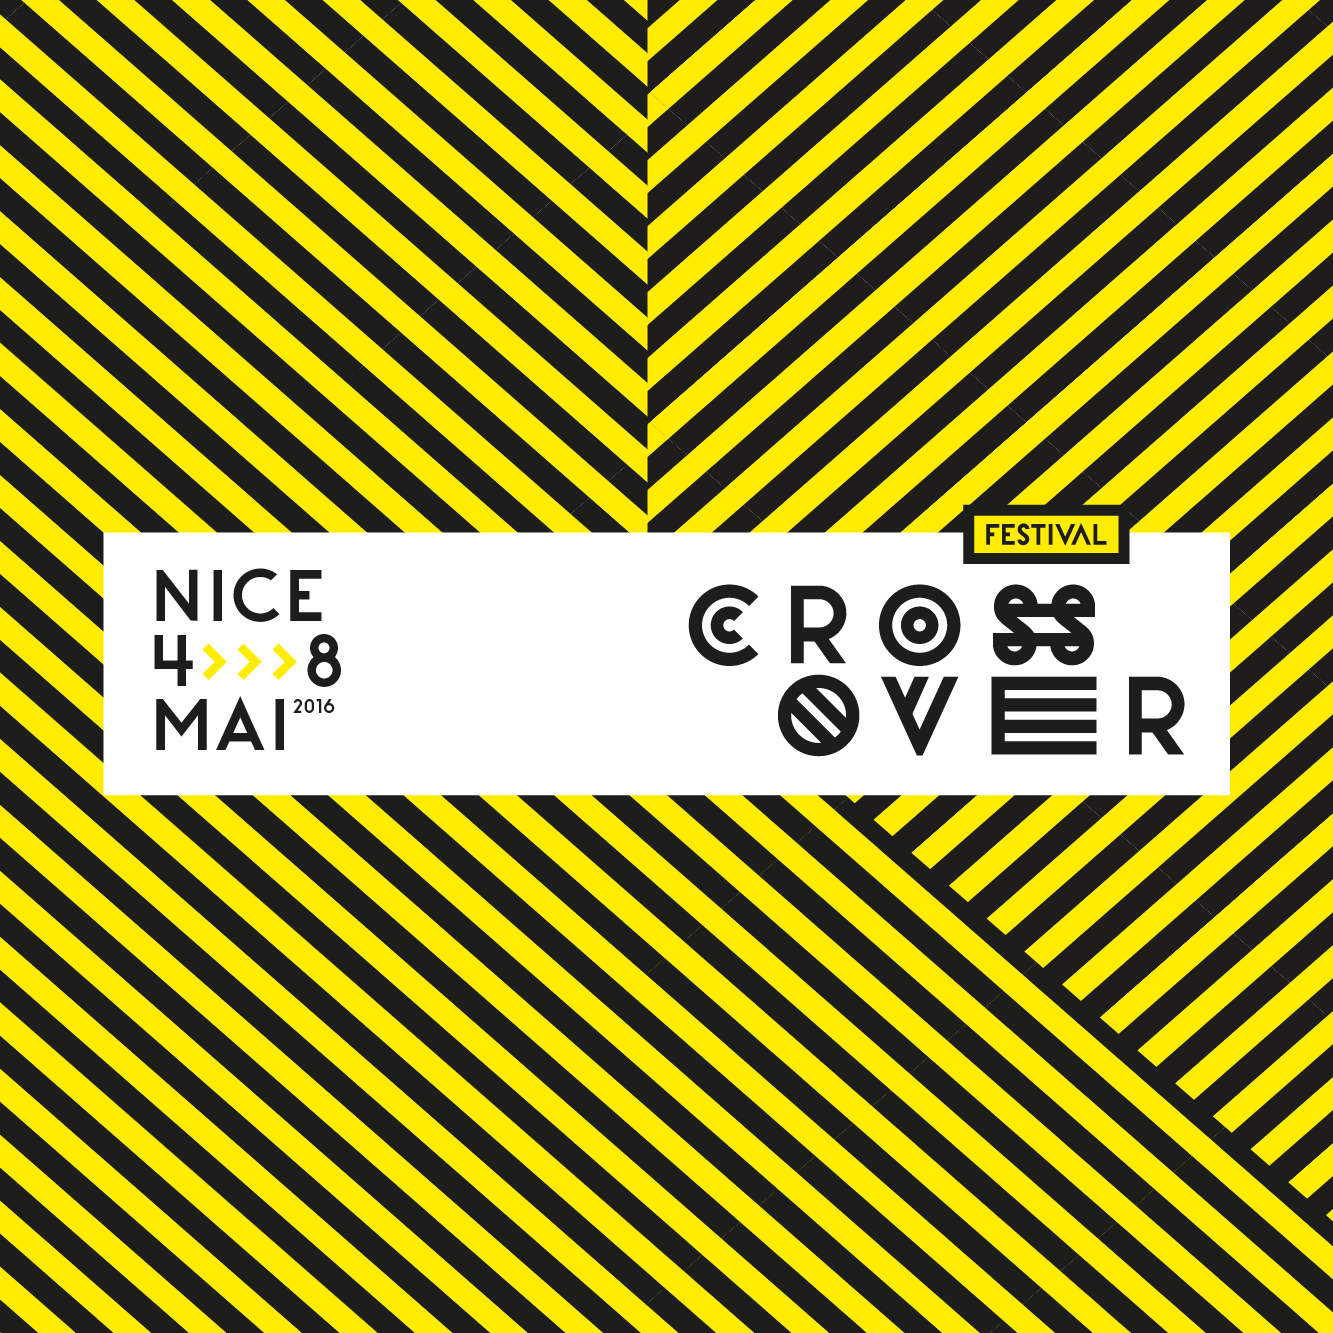 Festival CROSSOVER Nice 2016.